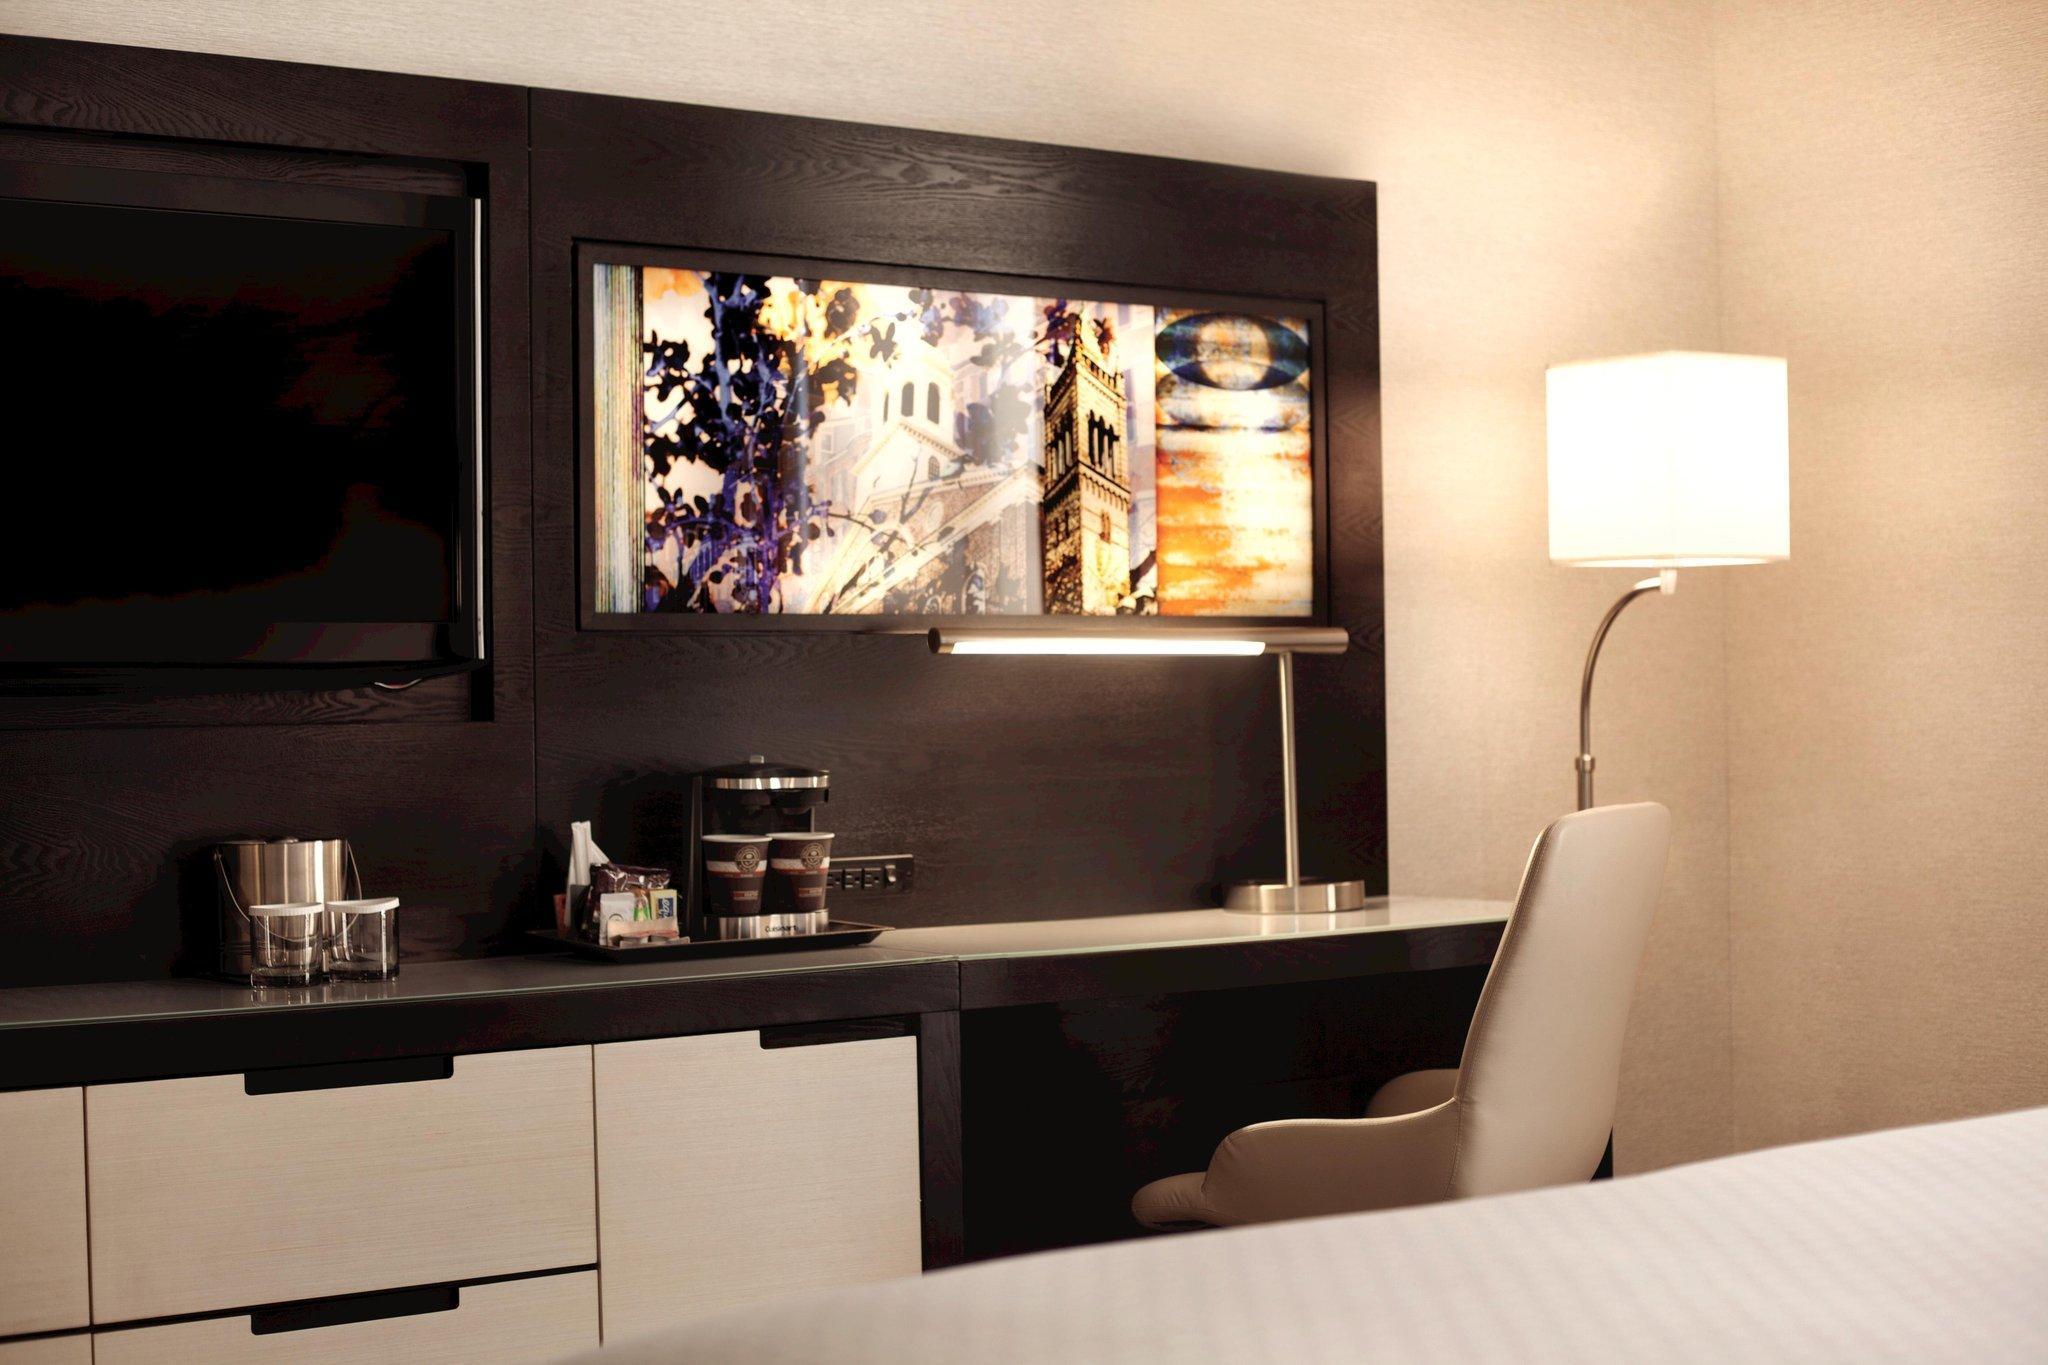 DoubleTree By Hilton Hotel Boston Downtown